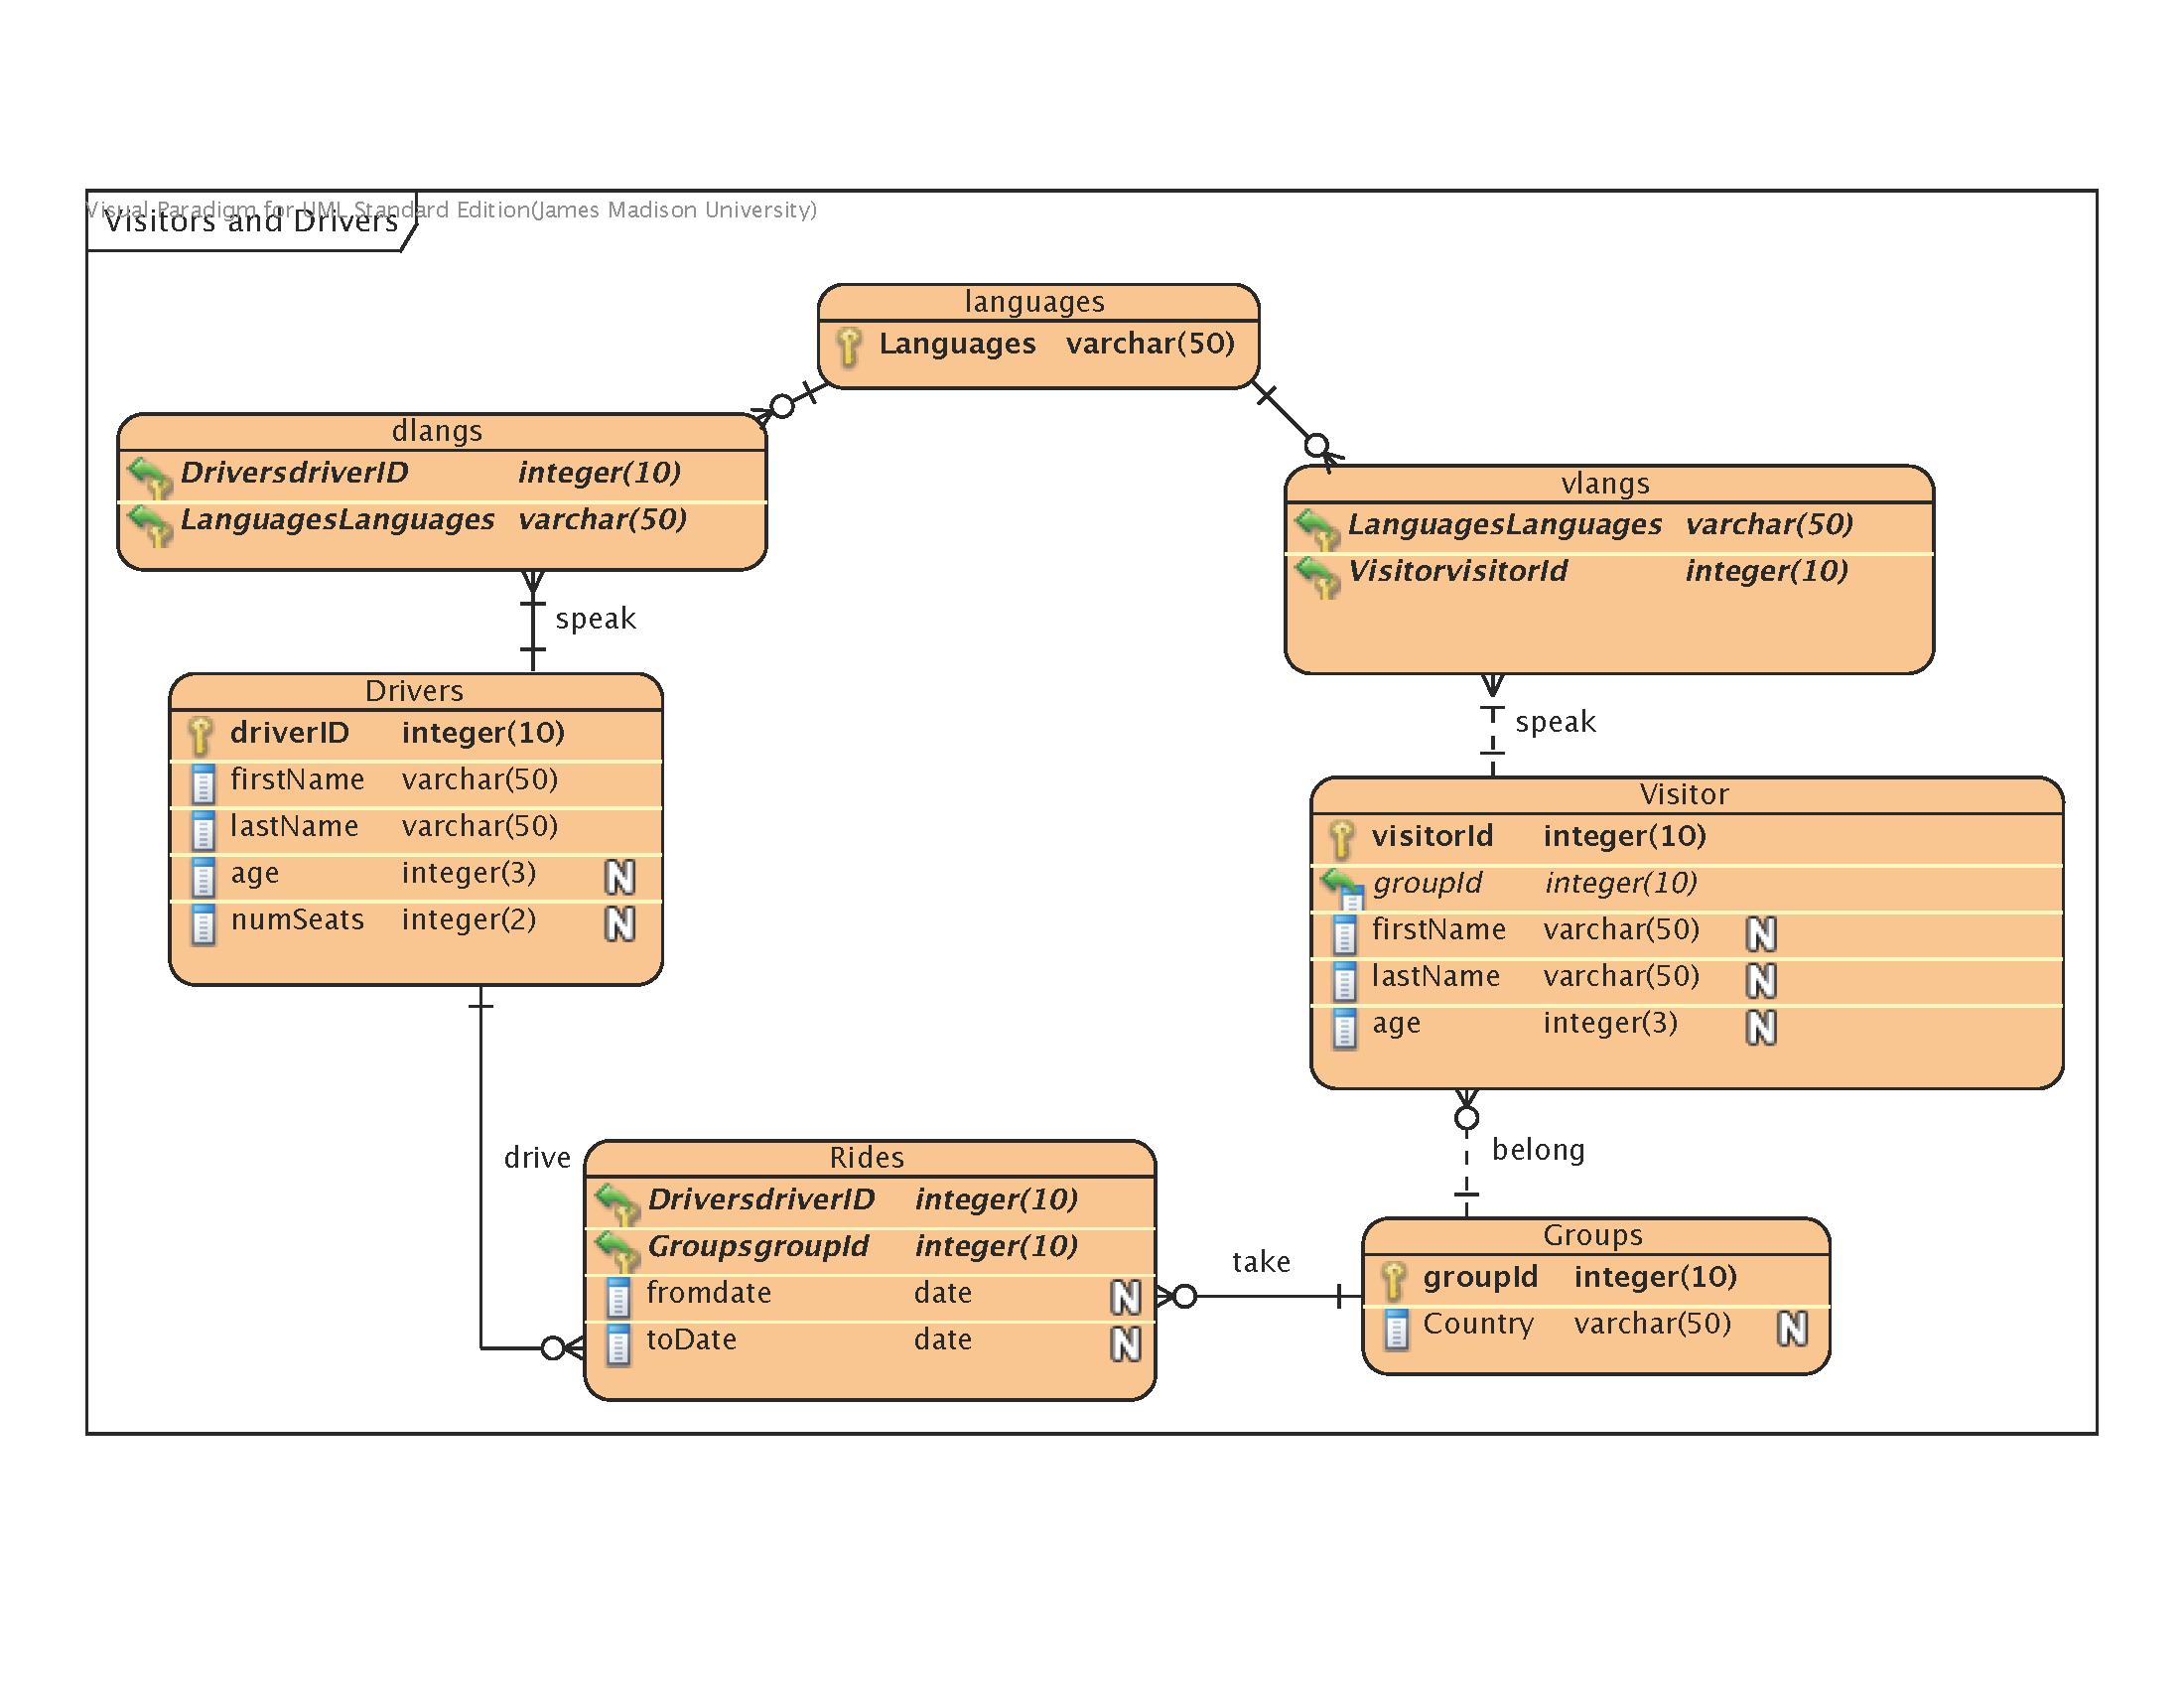 Erd-Visual Paradigm intended for Foreign Key In Er Diagram